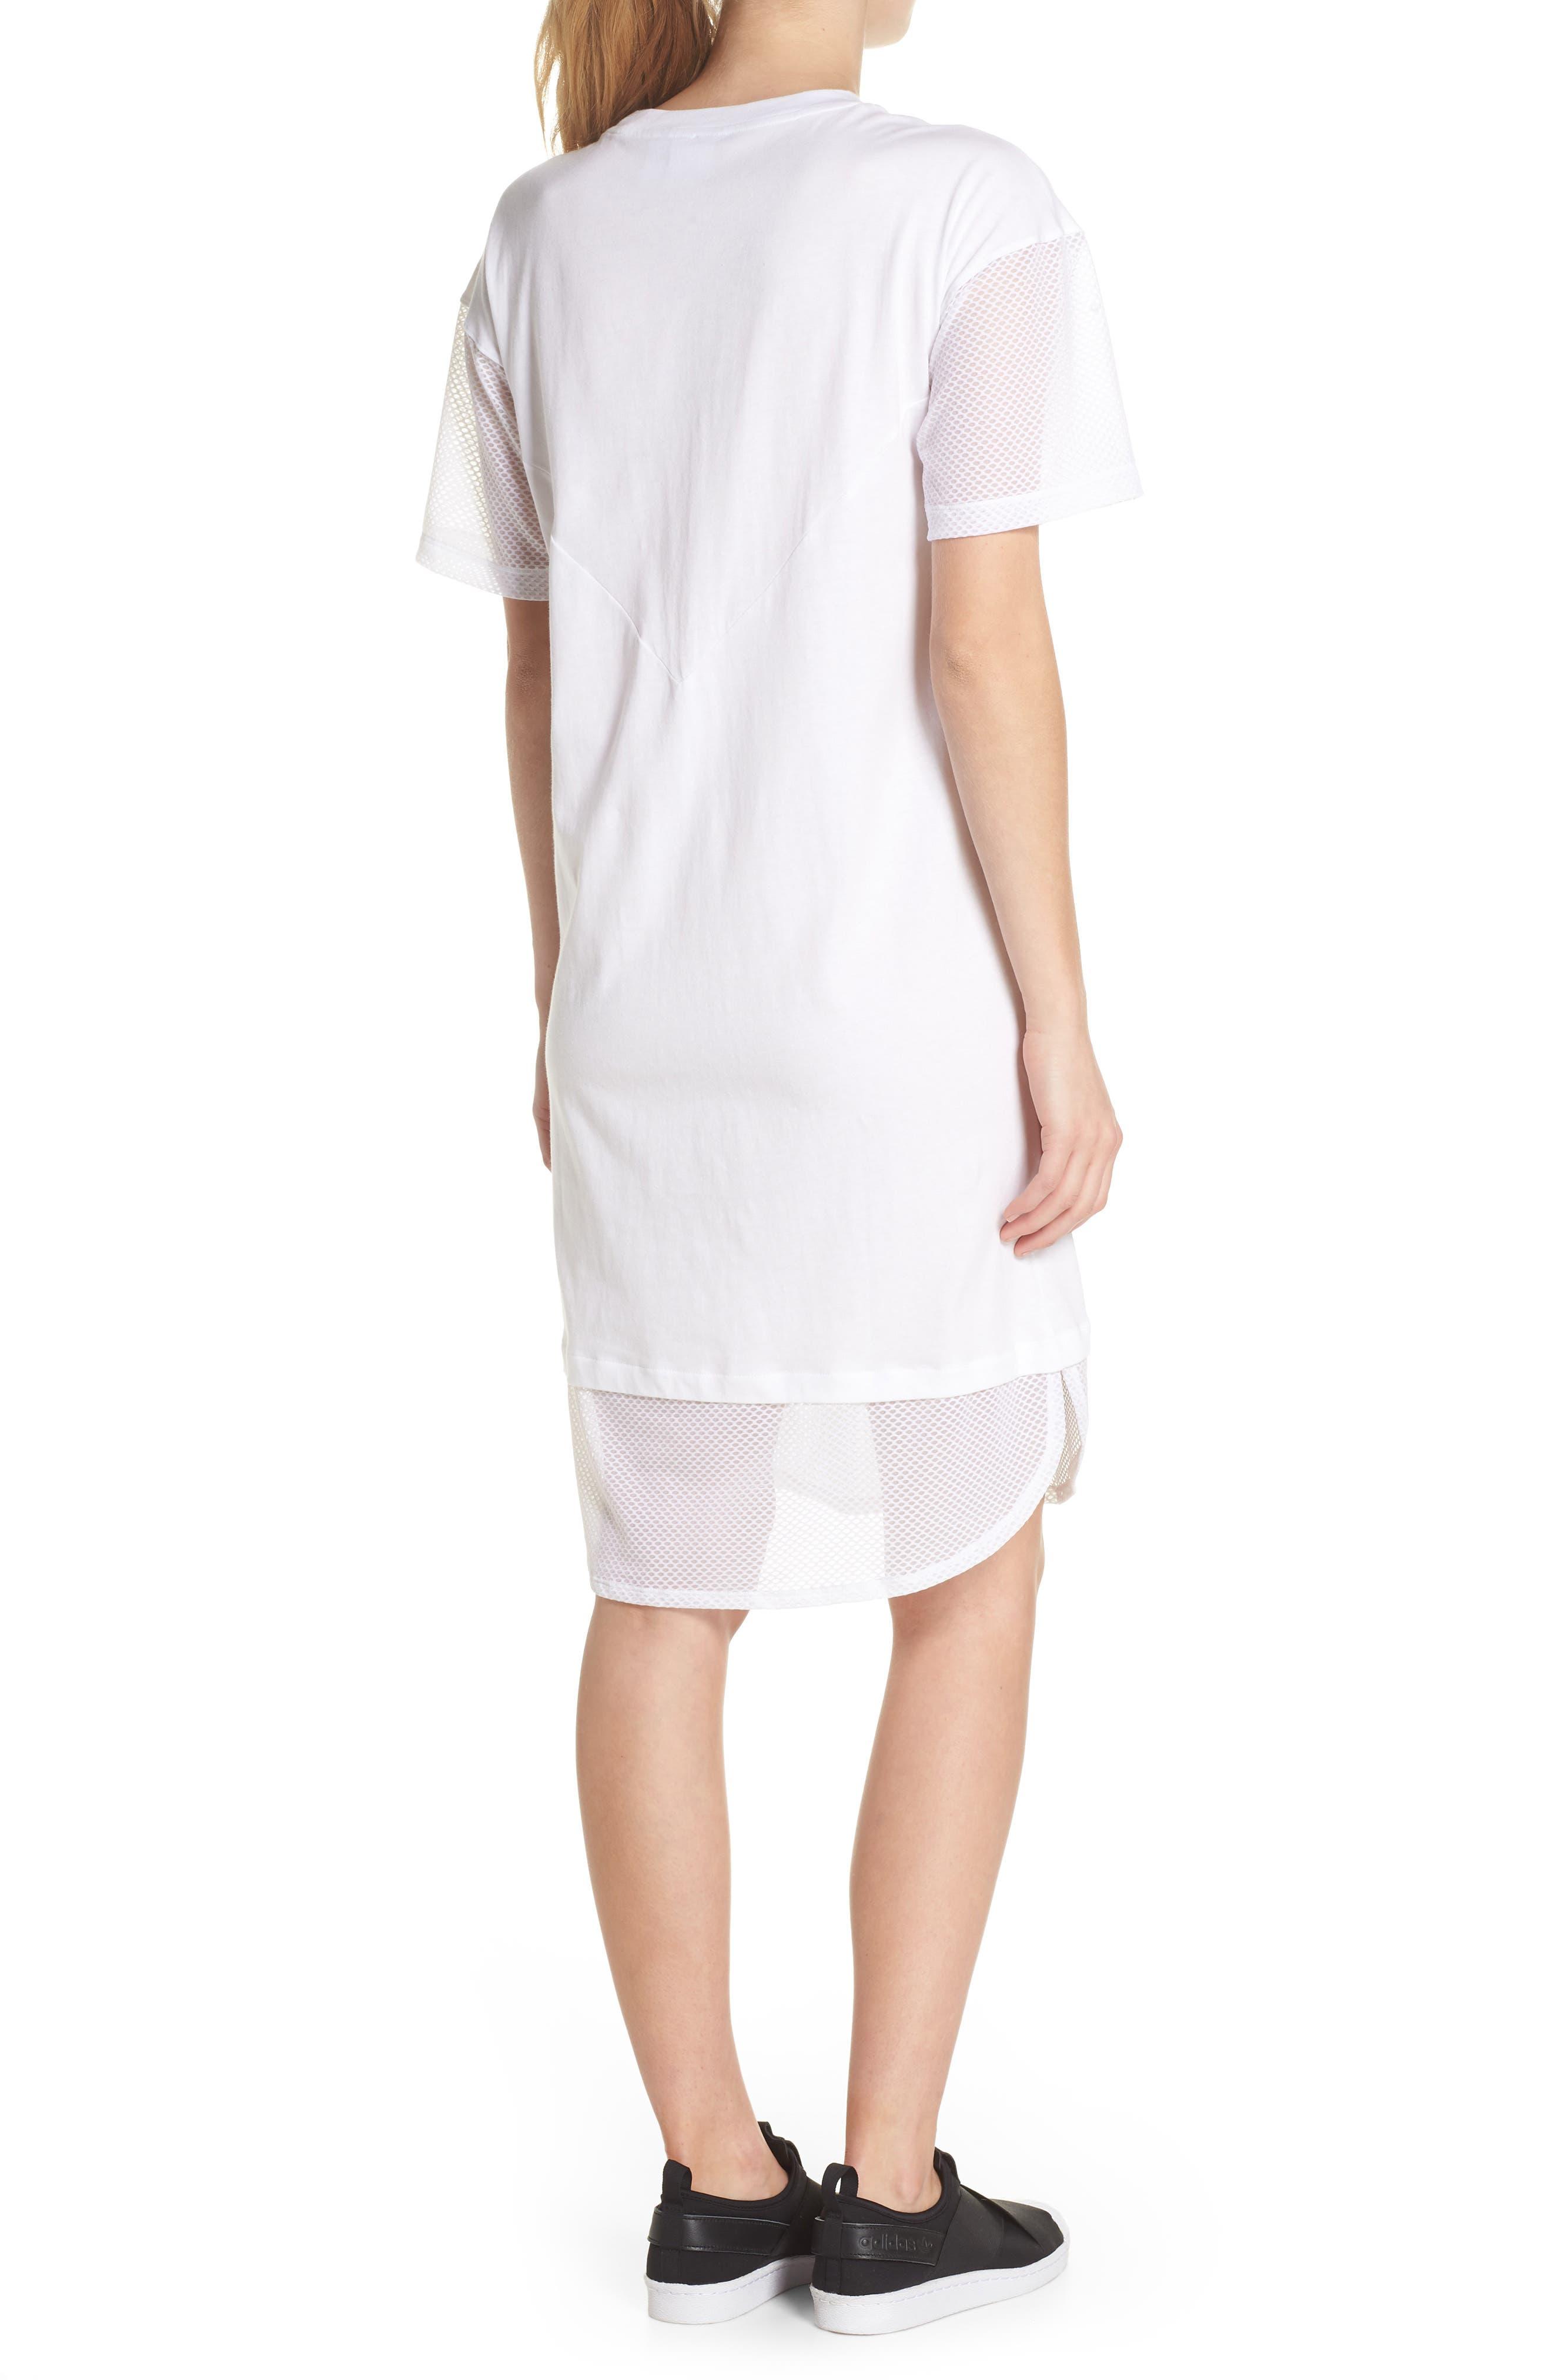 CLRDO T-Shirt Dress,                             Alternate thumbnail 2, color,                             100